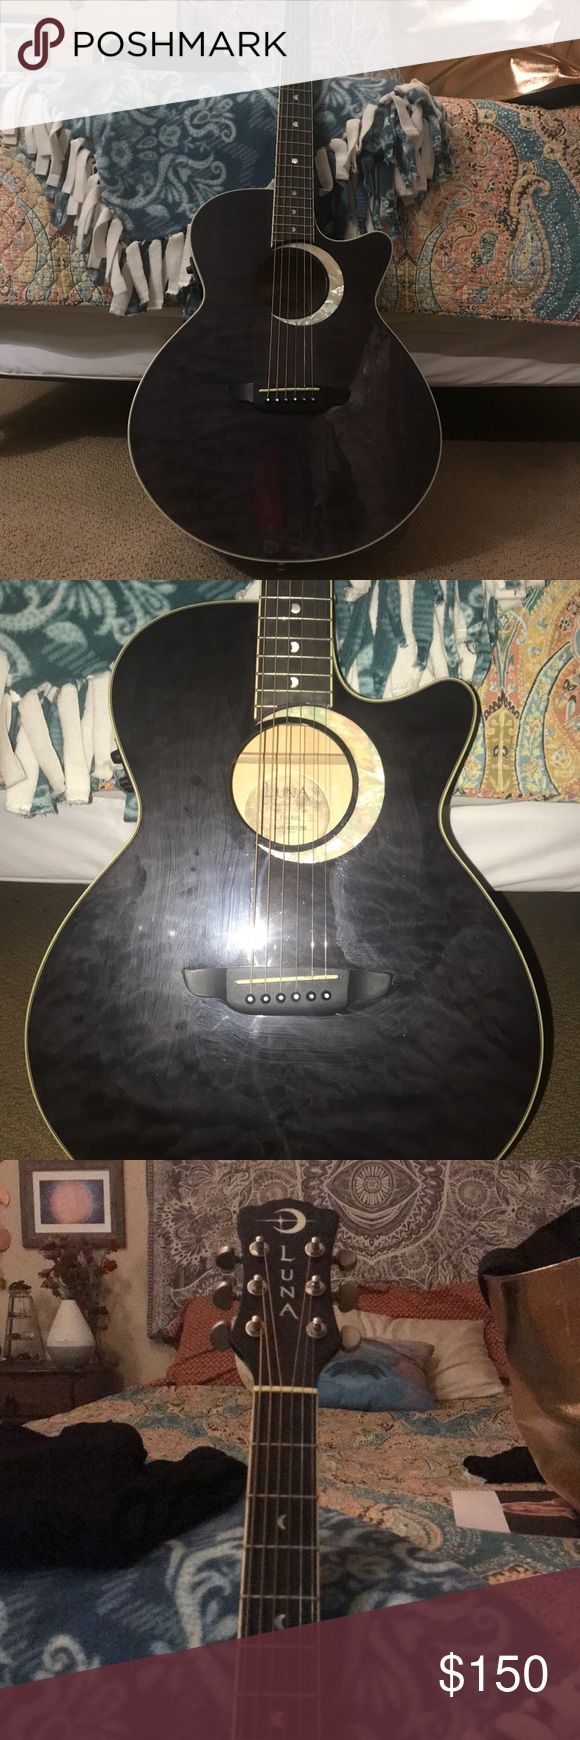 Luna eclipse guitar in black Luna eclipse guitar in black Six string One year old Only used a dozen times luna Accessories